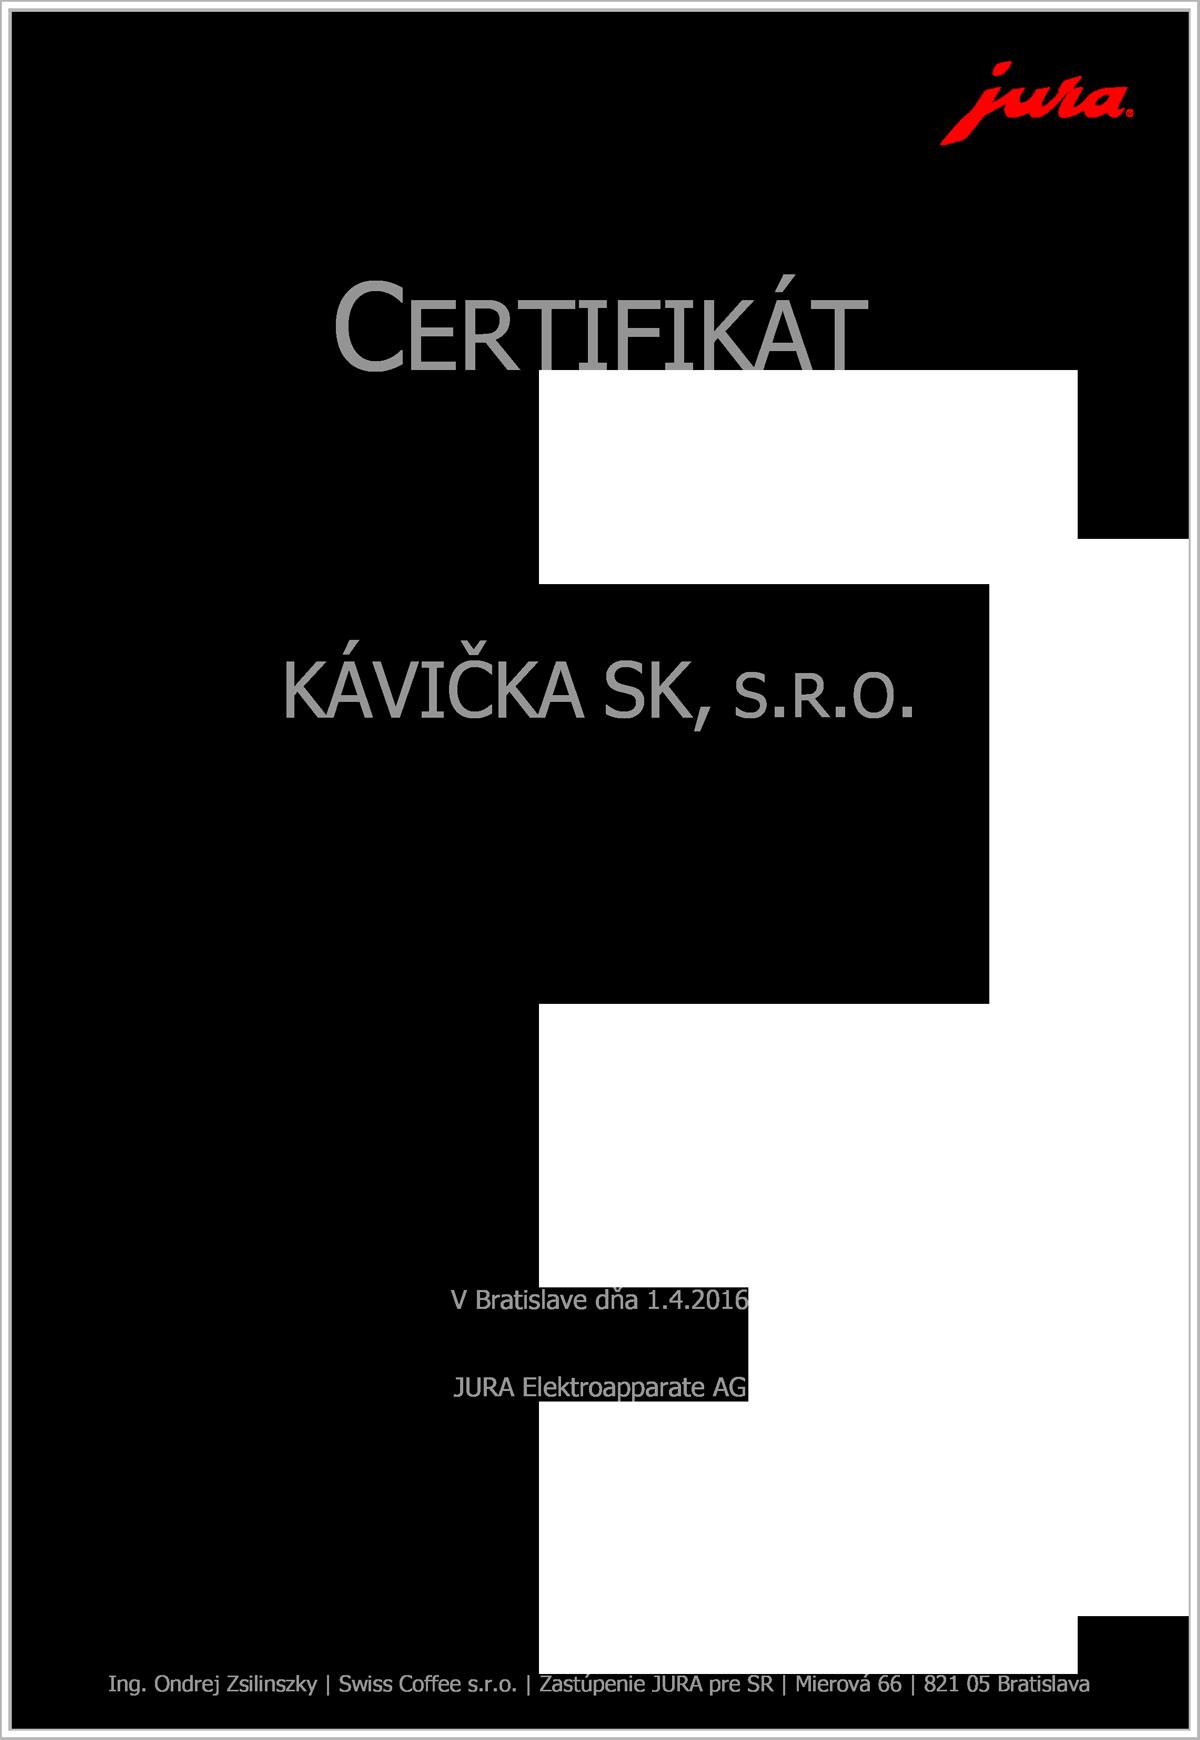 JURA_certifikat